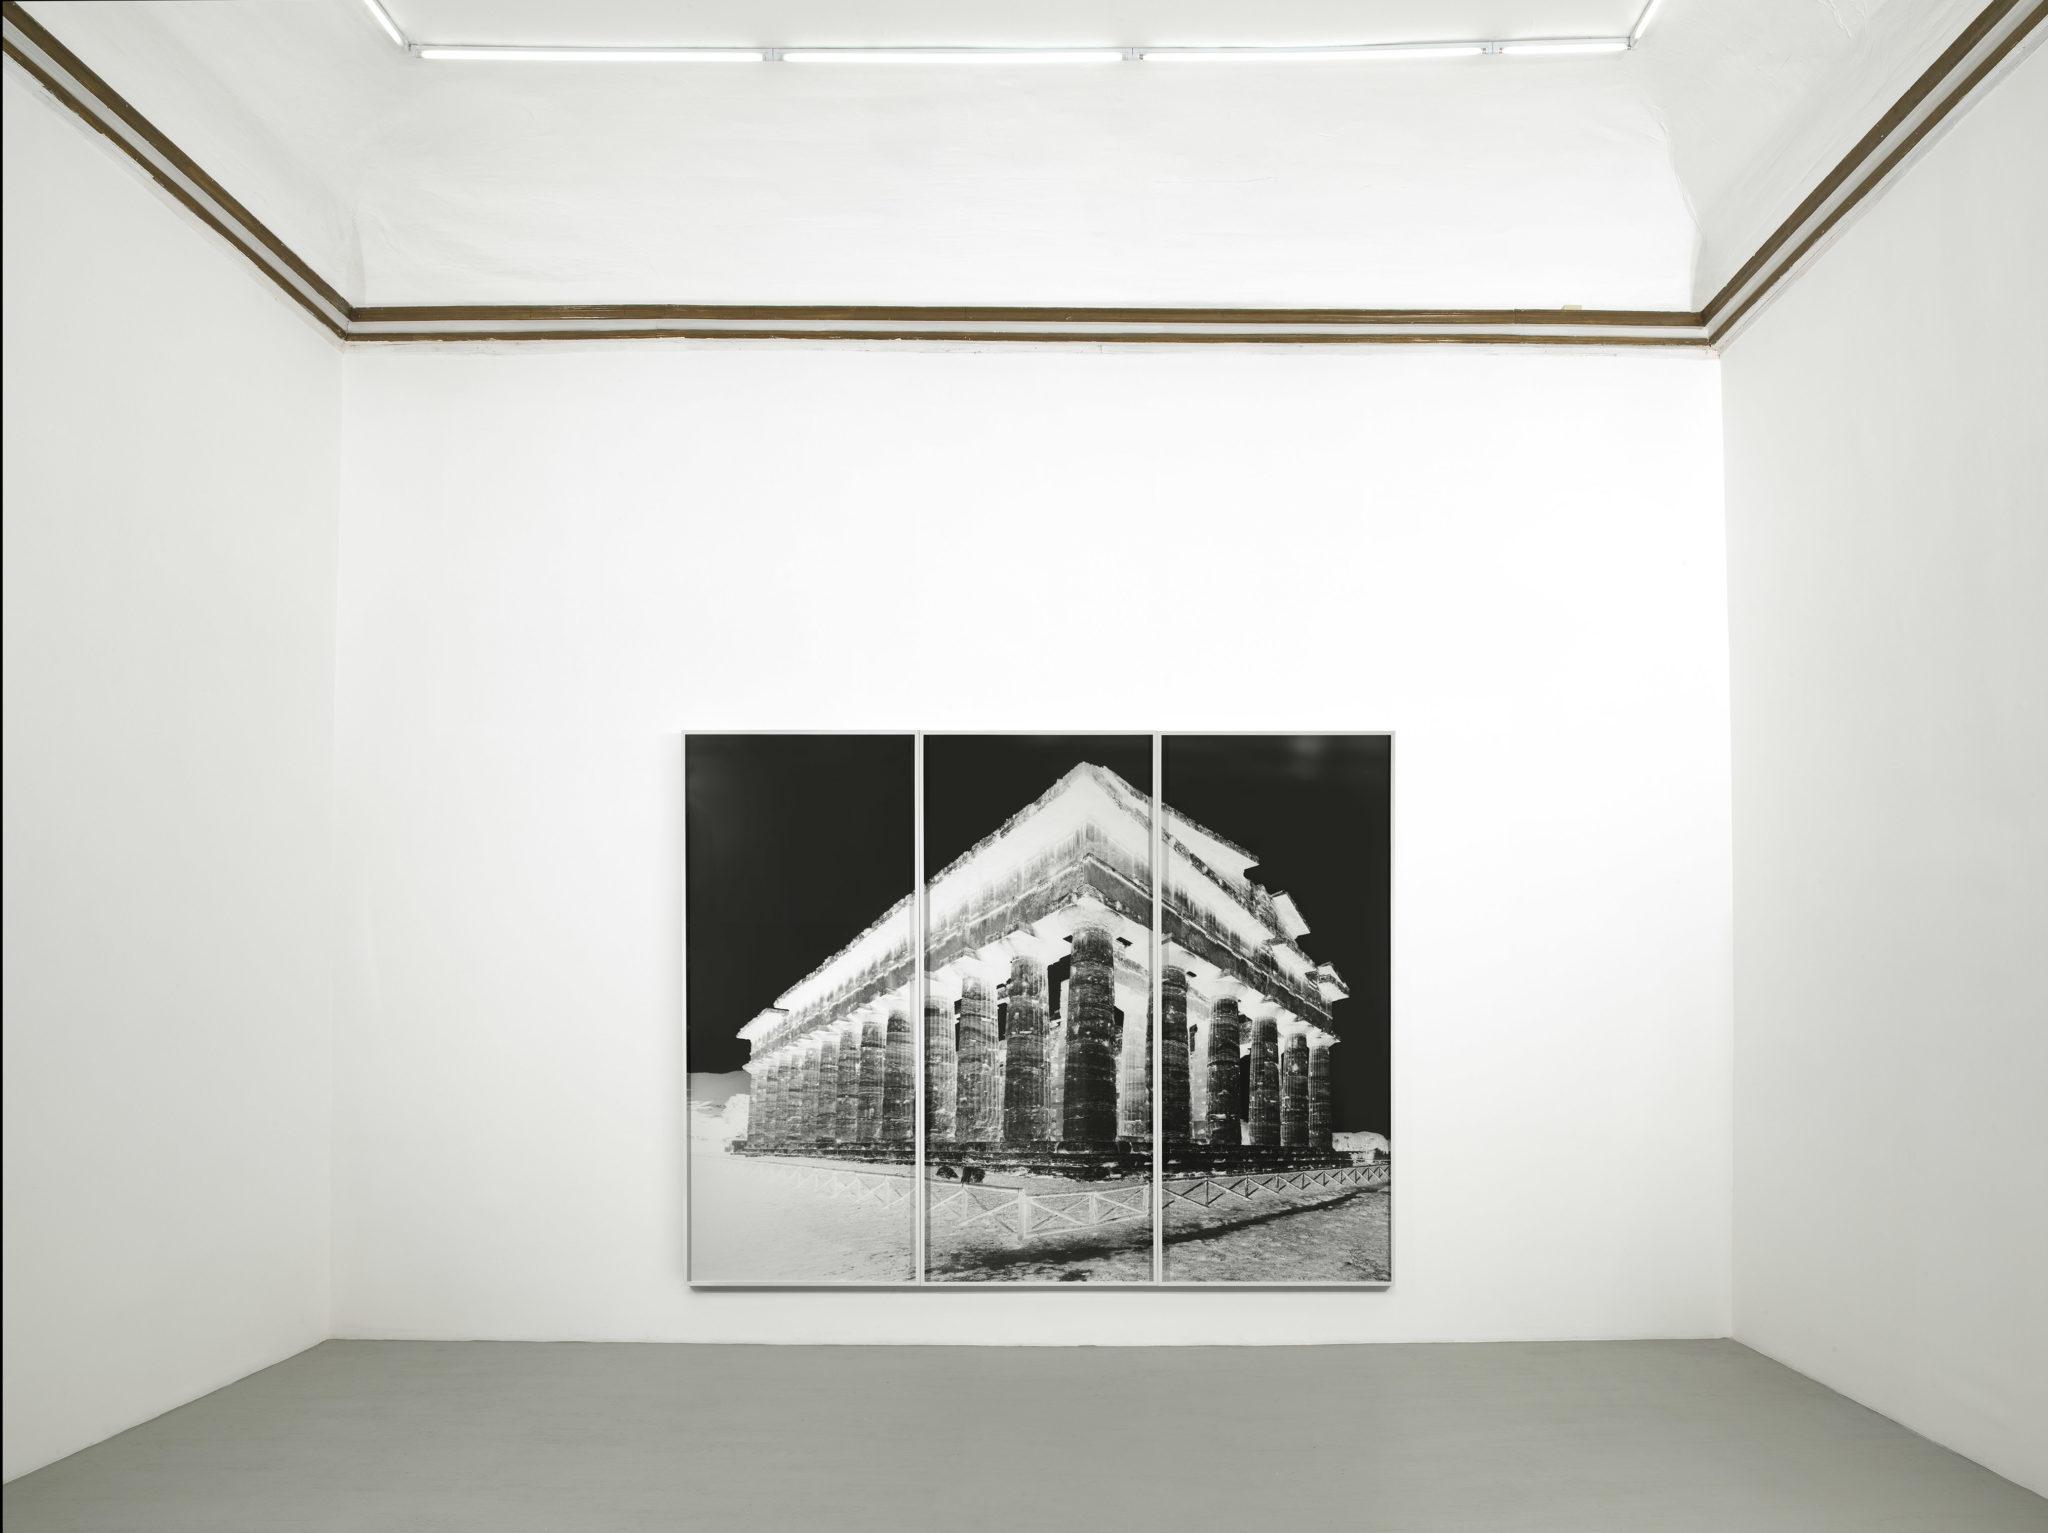 Vera Lutter: Paestum. Visioni in bianco e nero